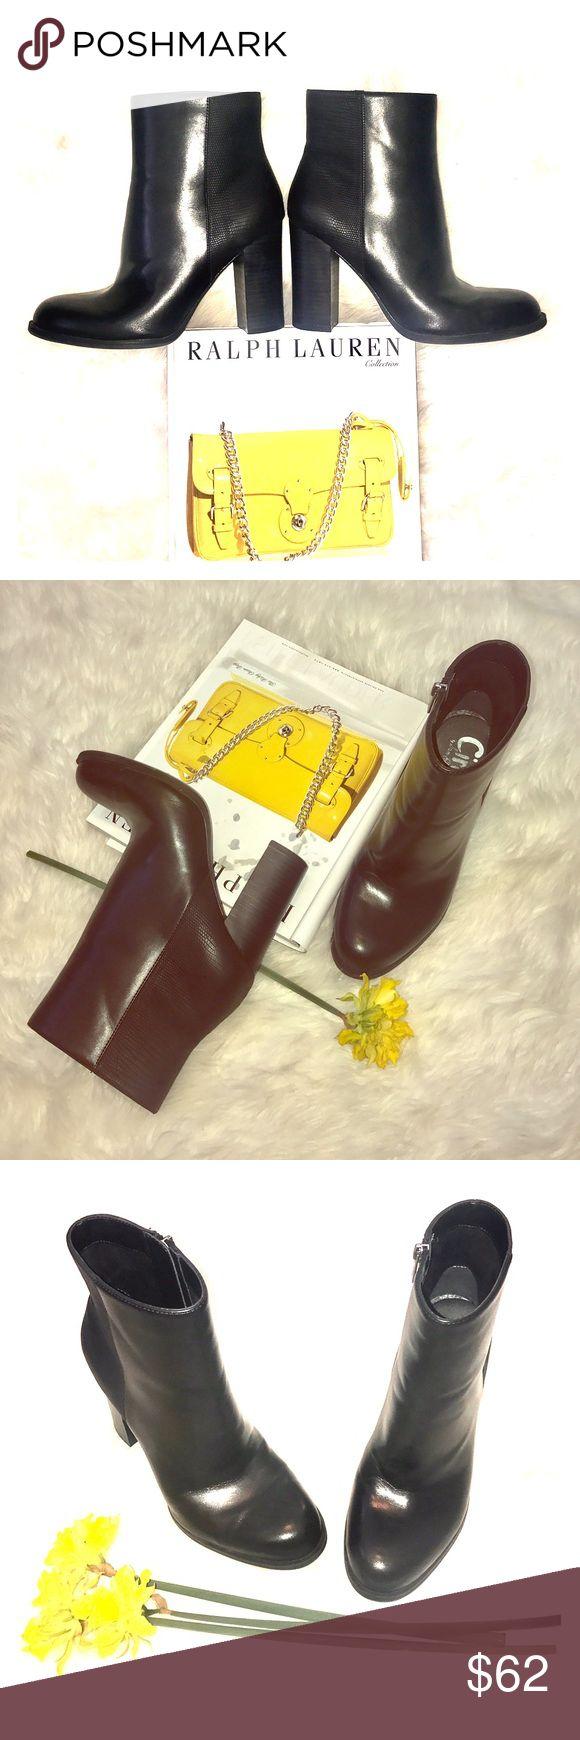 "🍒 Sam Edelman heels Great condition WORN few times man made black bootie size-8.5 heel-4"". Circus by Sam Edelman Circus by Sam Edelman Shoes Ankle Boots & Booties"